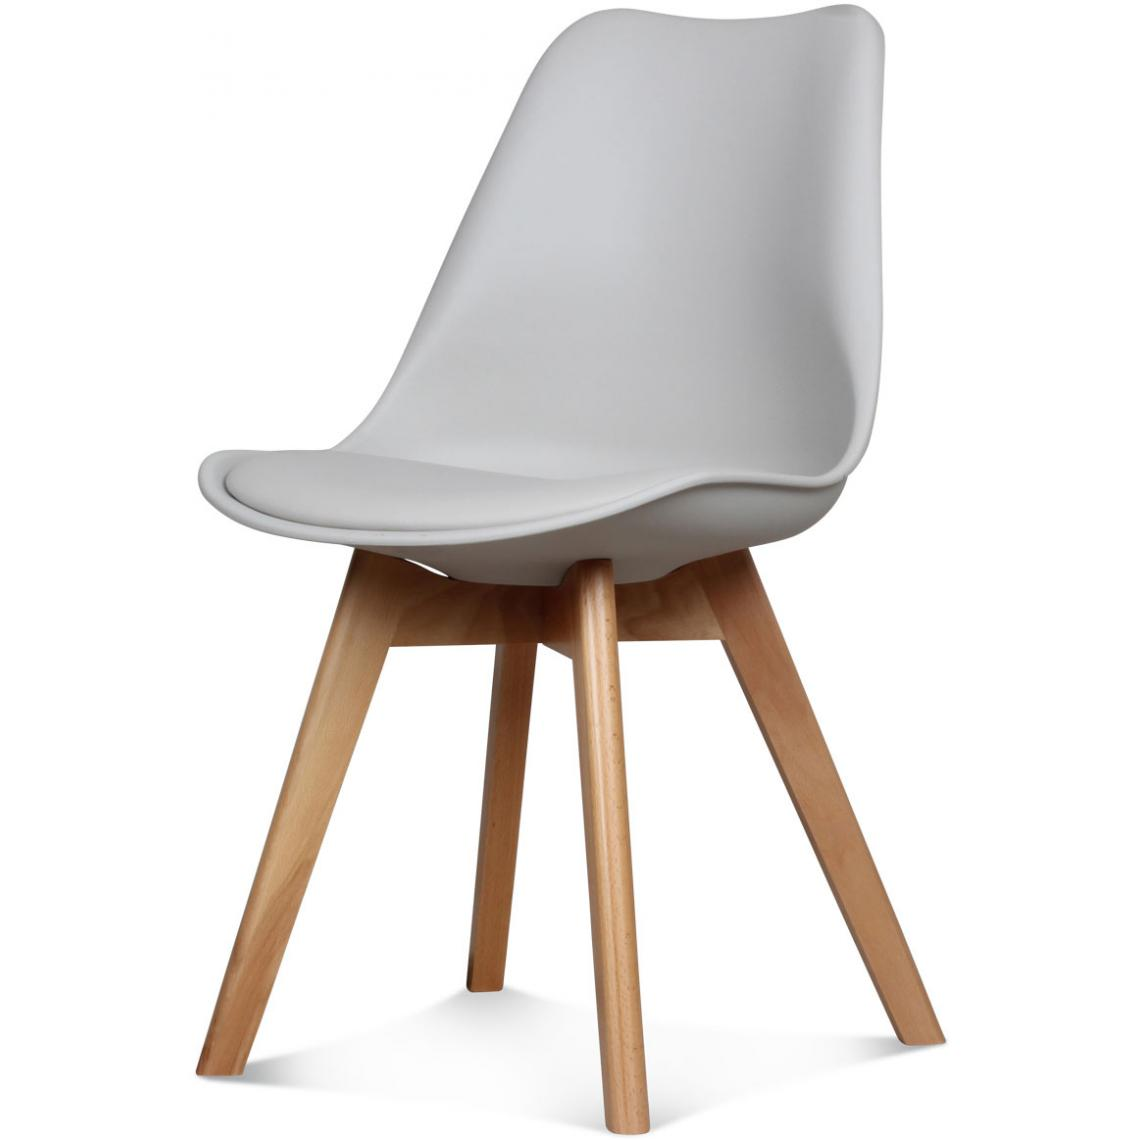 chaise design style scandinave taupe esben 3suisses. Black Bedroom Furniture Sets. Home Design Ideas